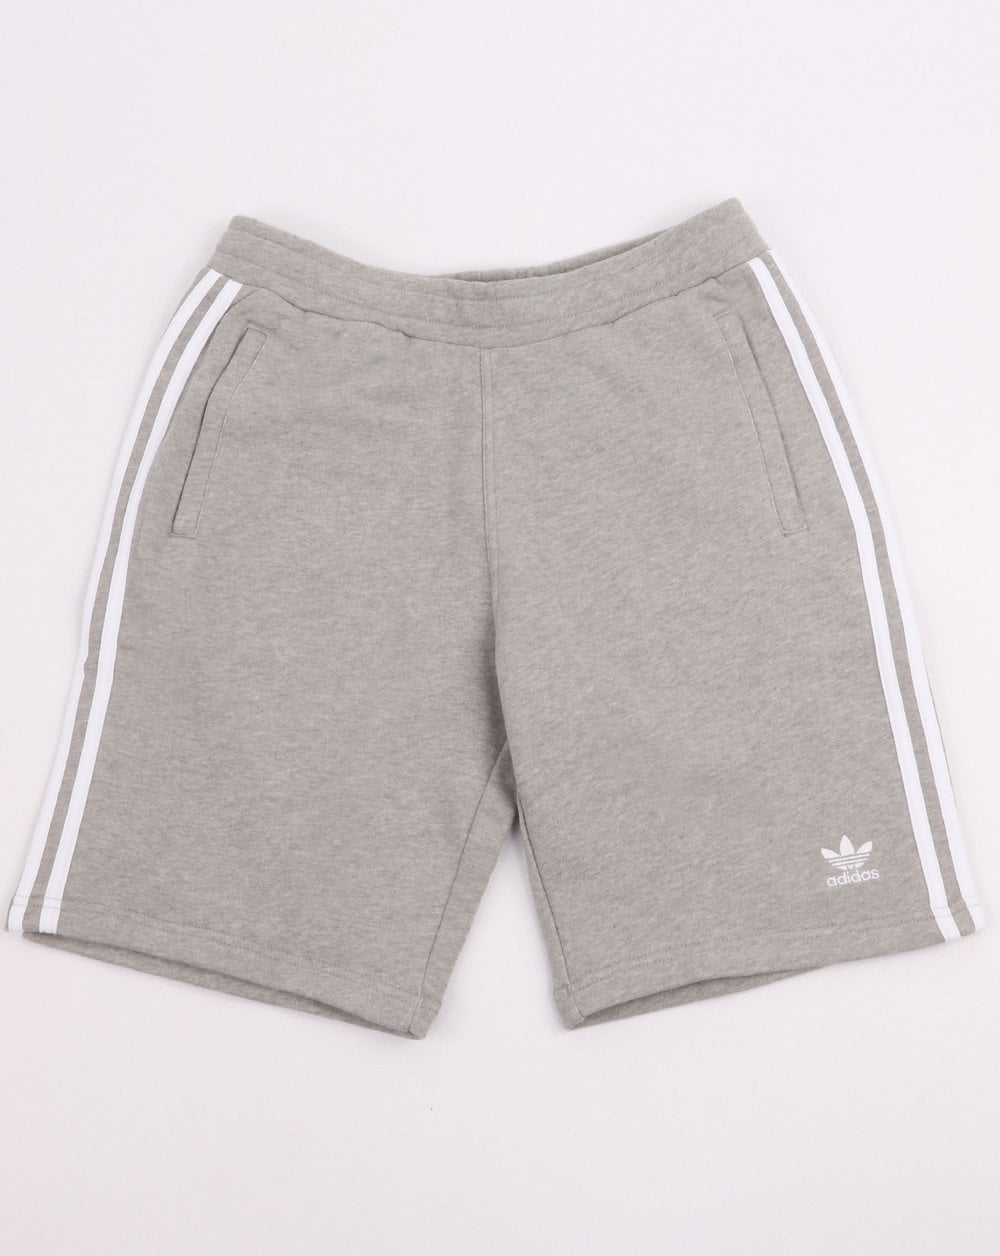 Adidas Originals 3 Stripes Shorts Grey Heather